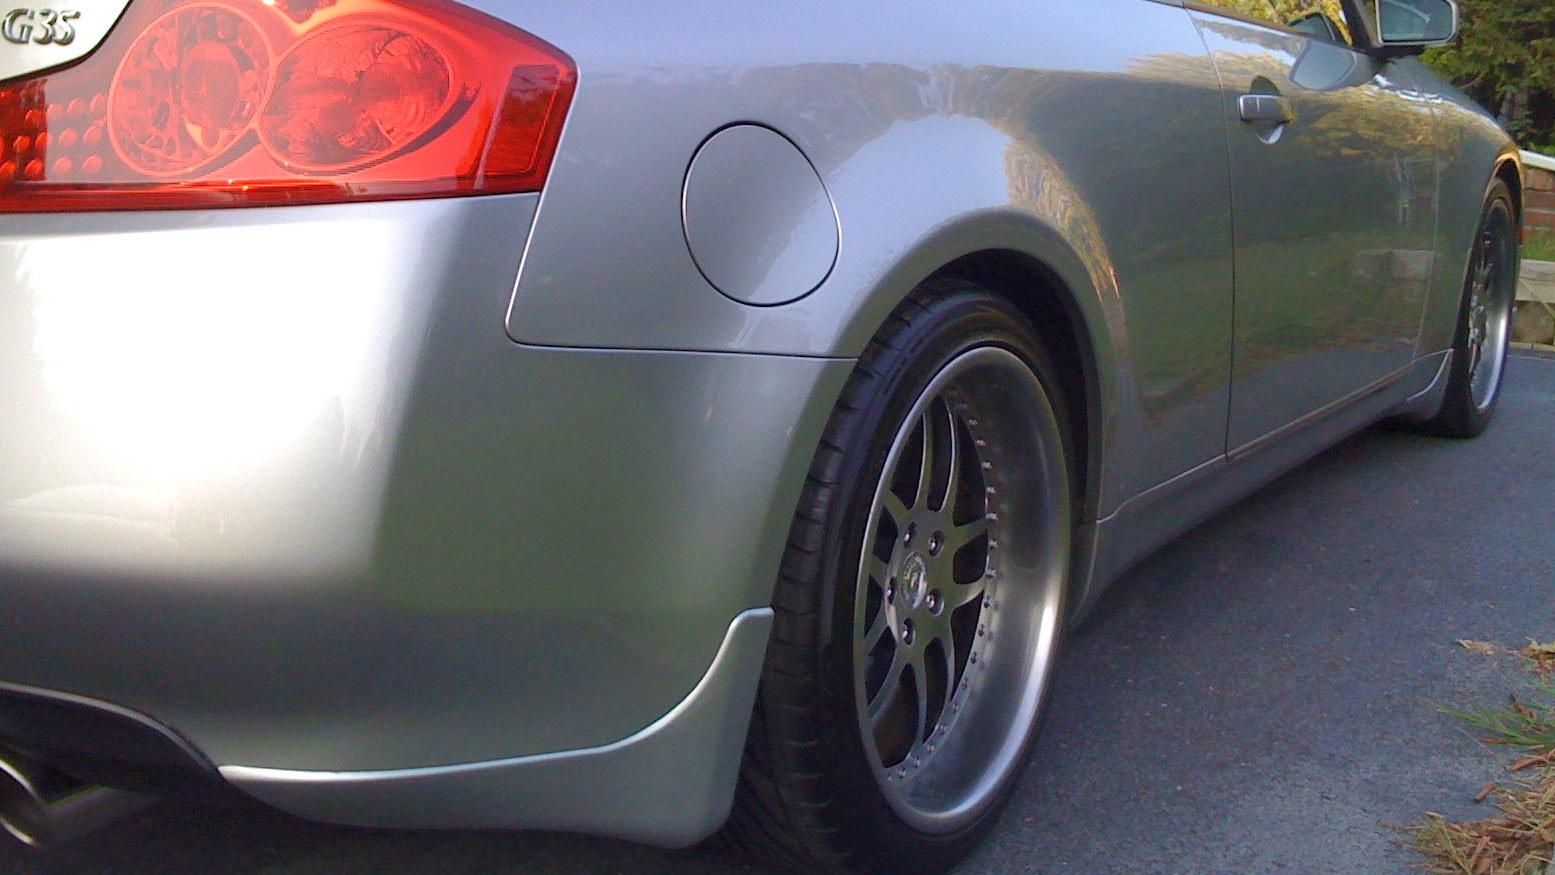 Wheels and brake 3.jpg